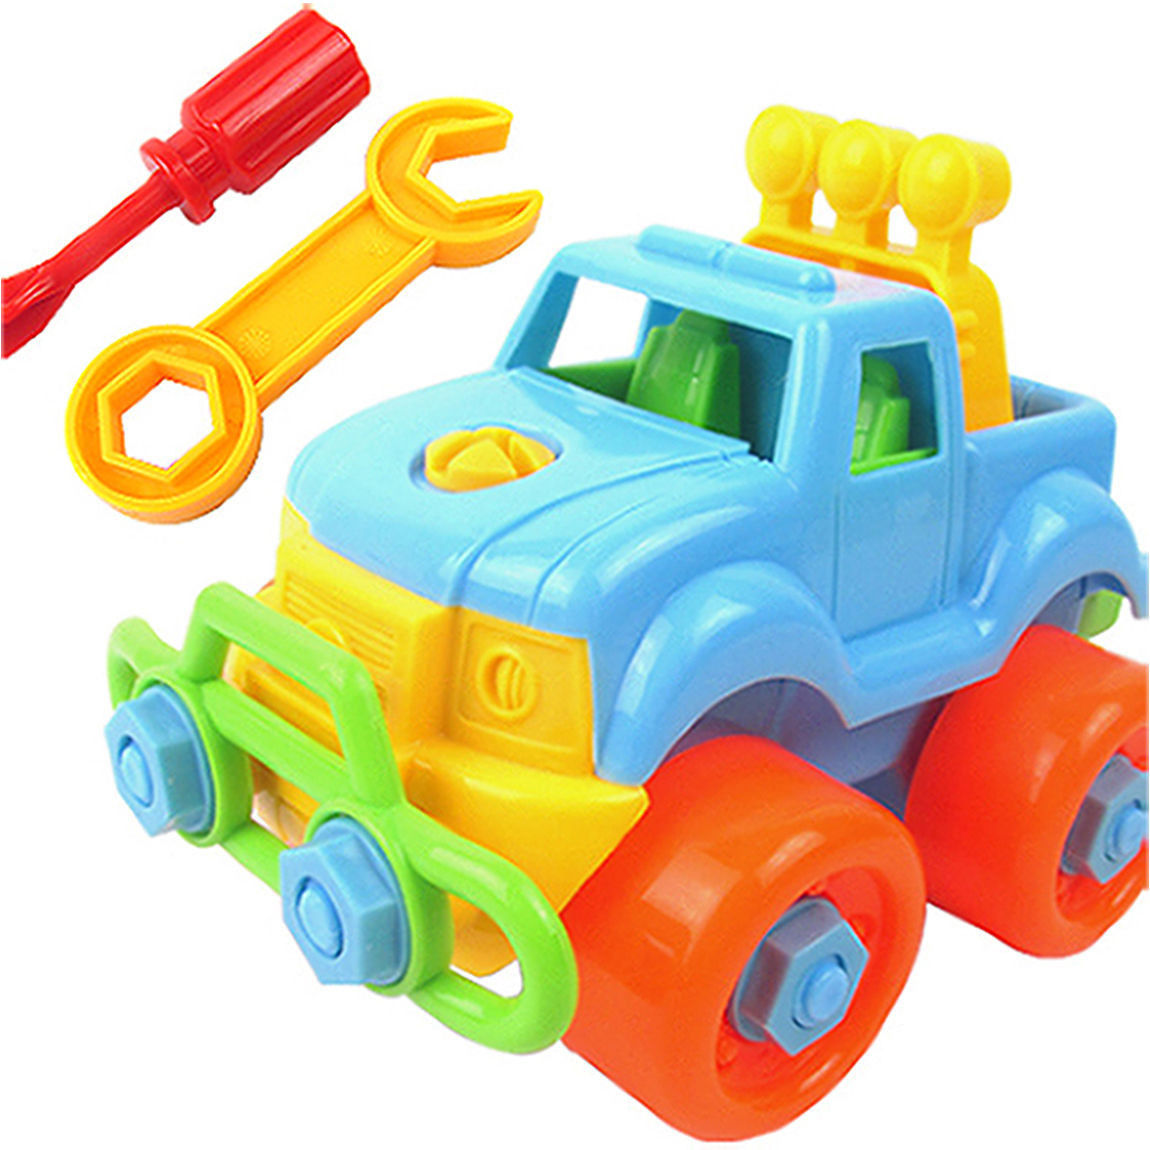 Funny DIY Disassembly Car Truck Developmental Toddler Baby Girls Boys Toy Gift Children Toys